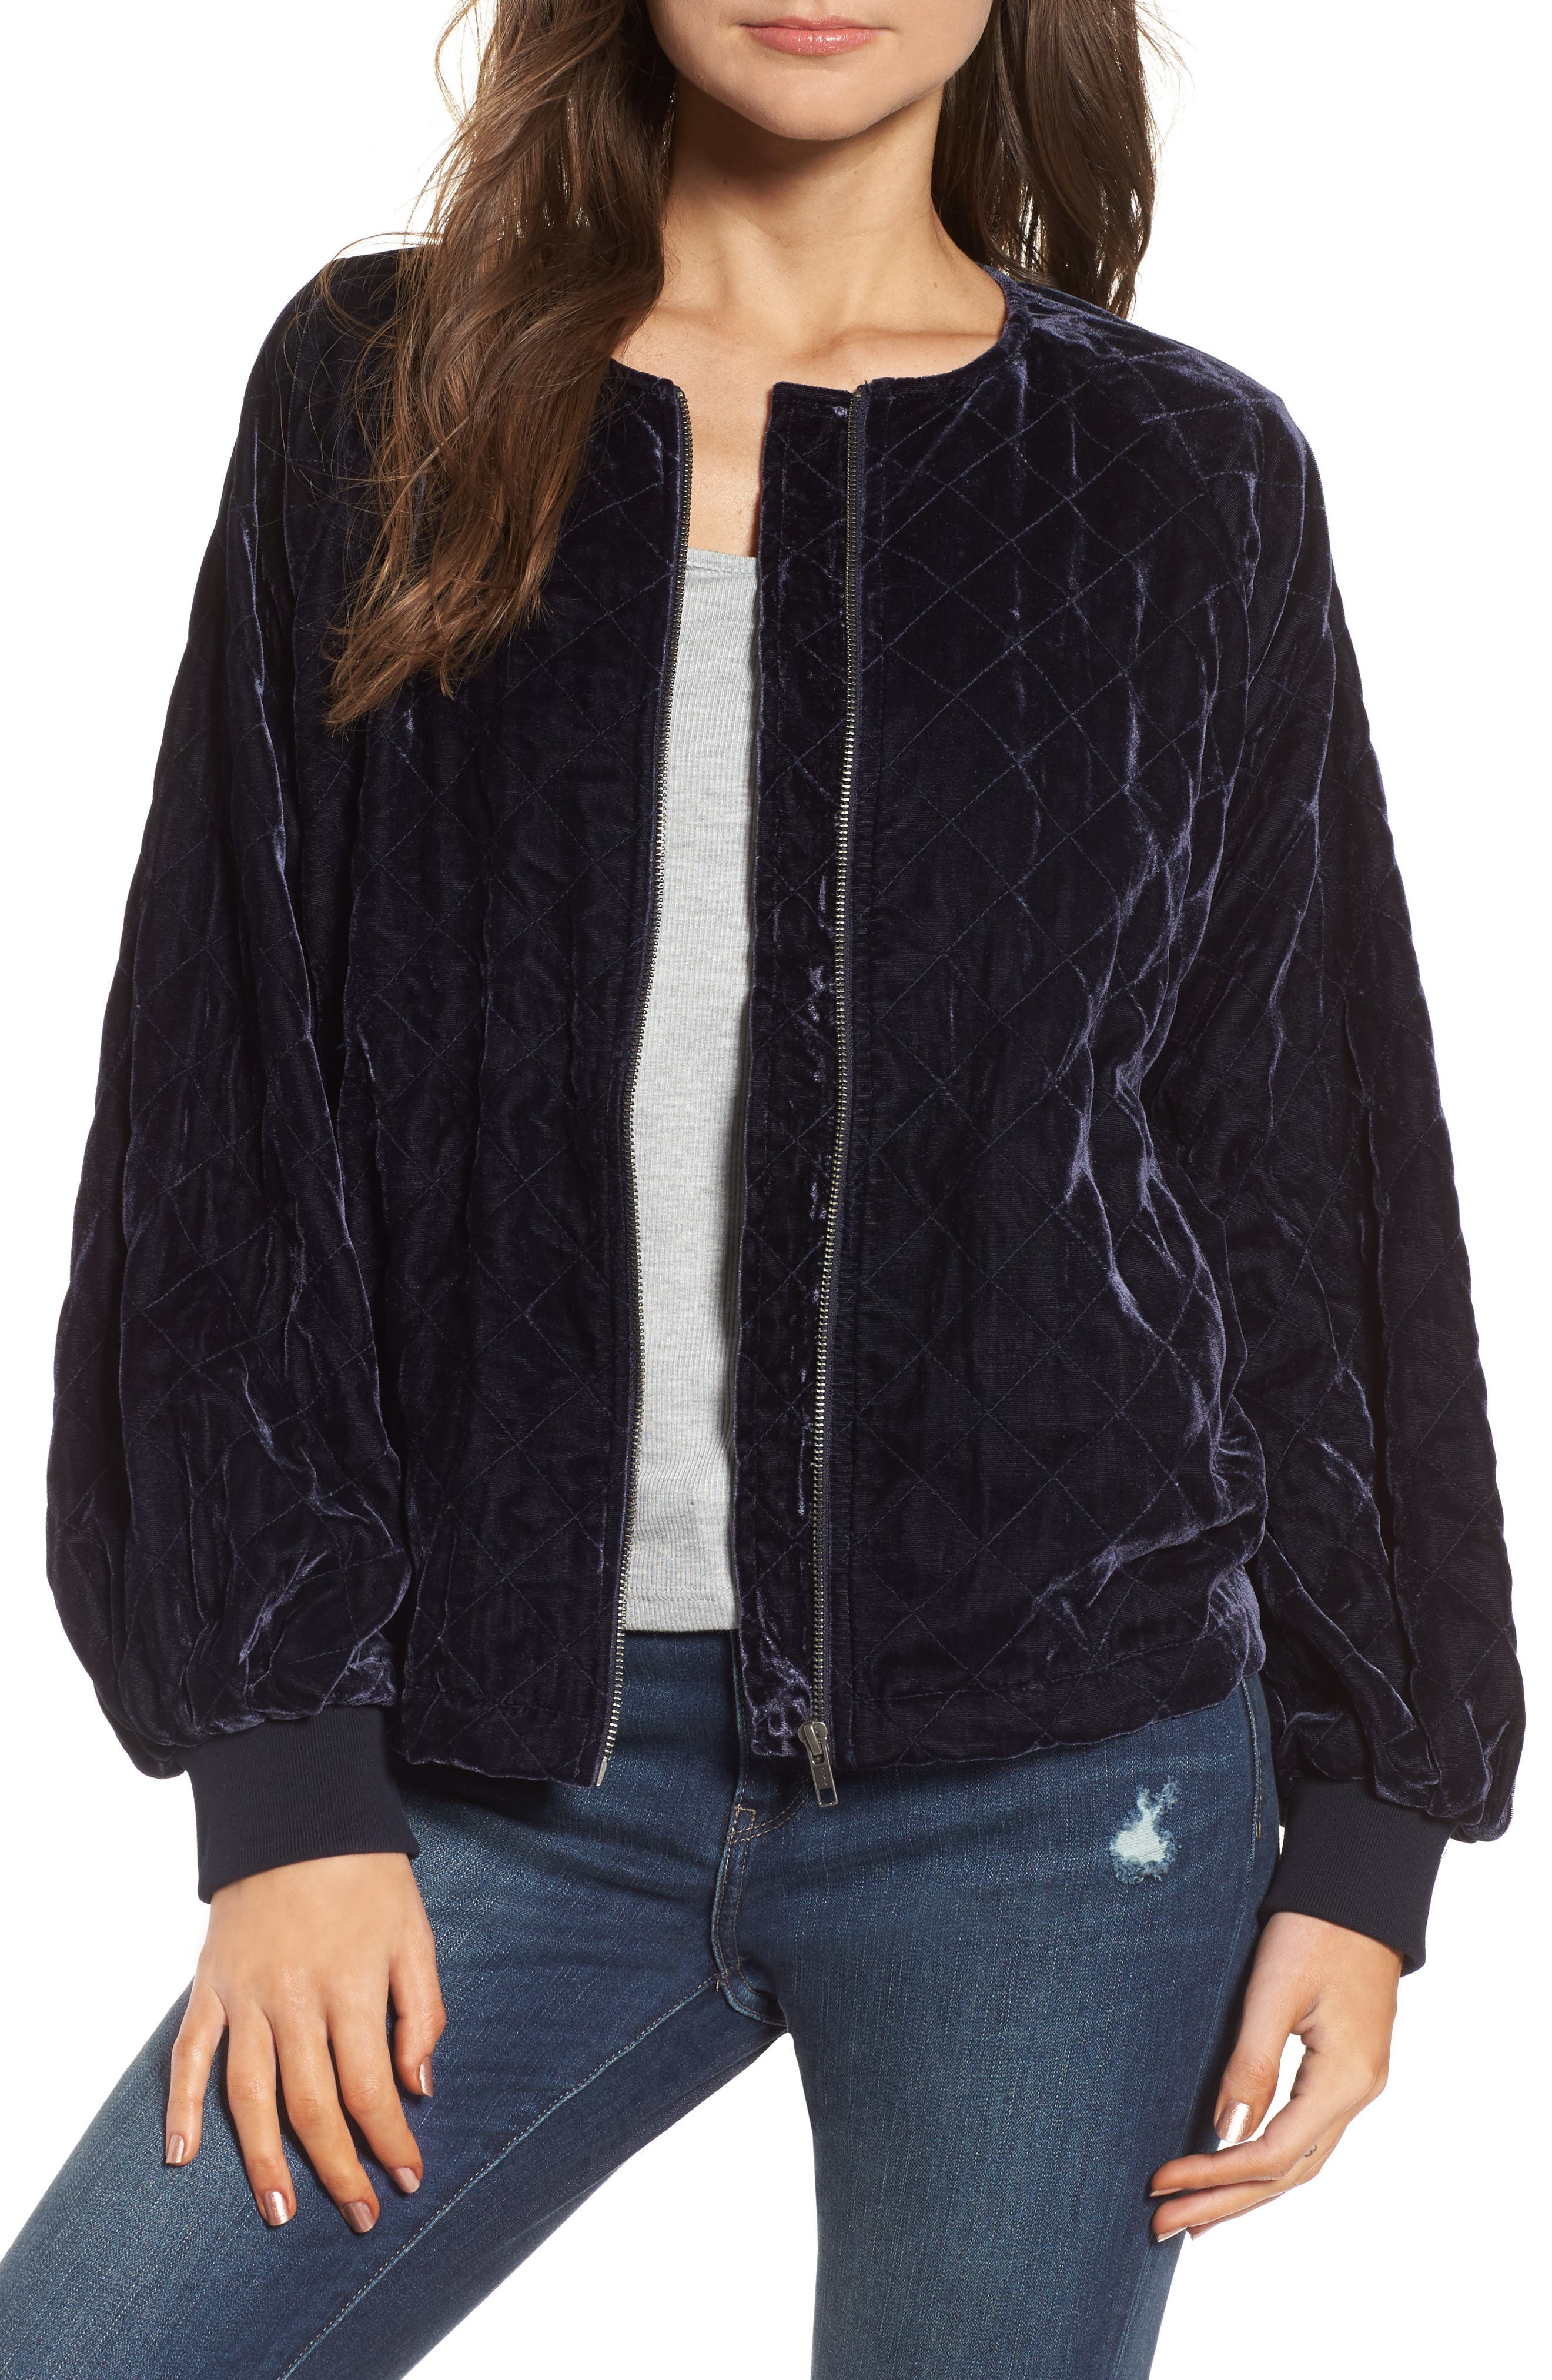 Hinge Quilted Velvet Jacket